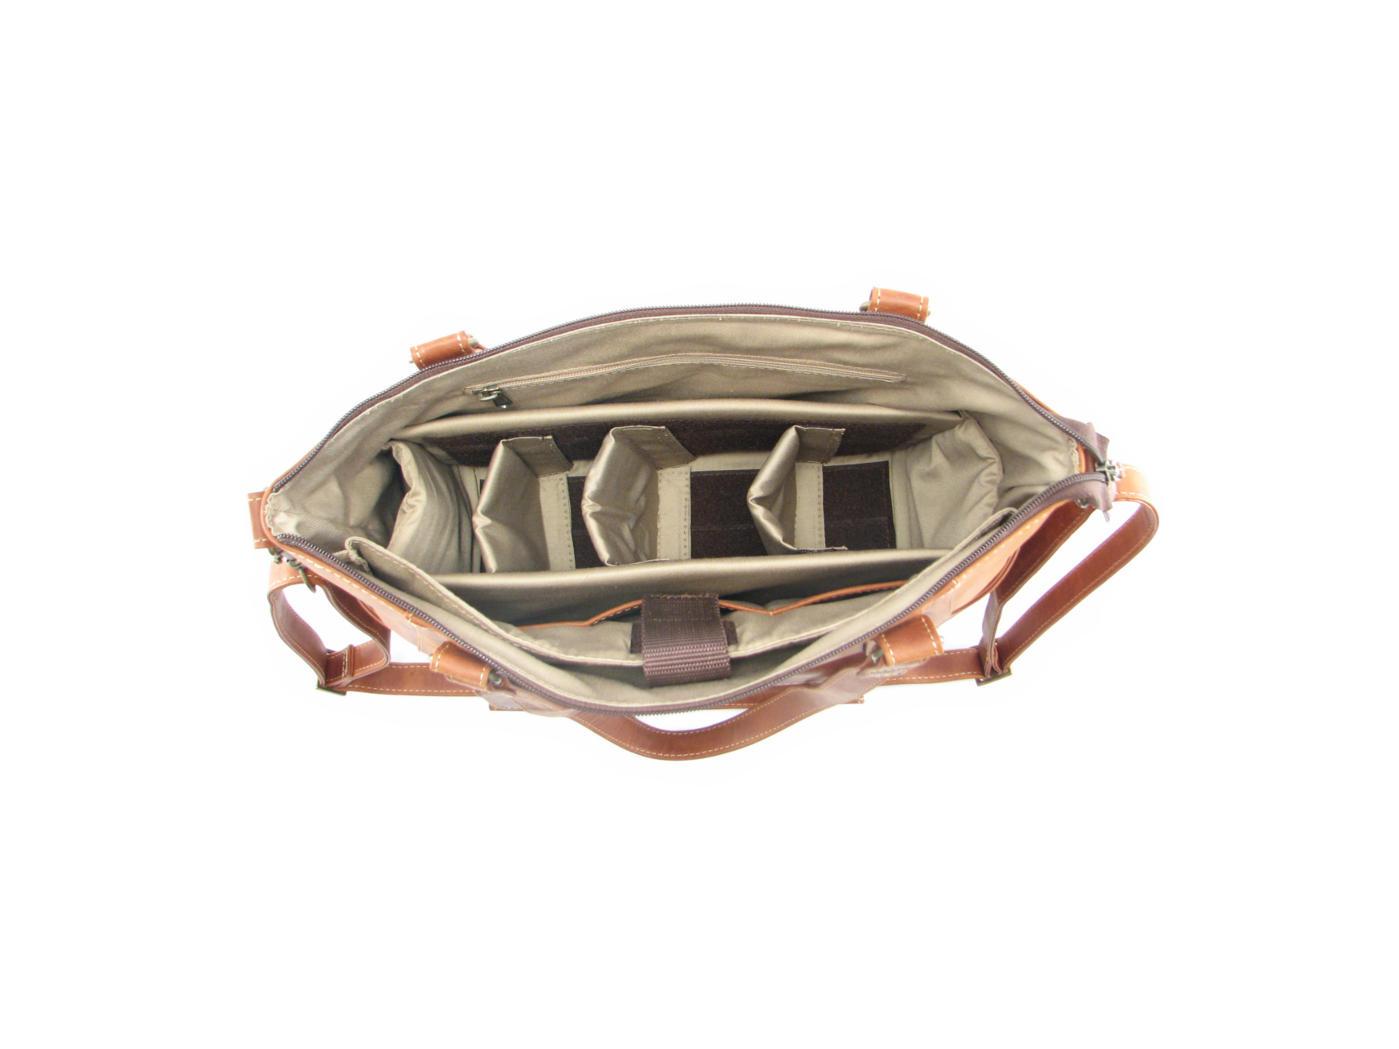 ad00e6d6ae64e Classic multi-functional diaper handbag